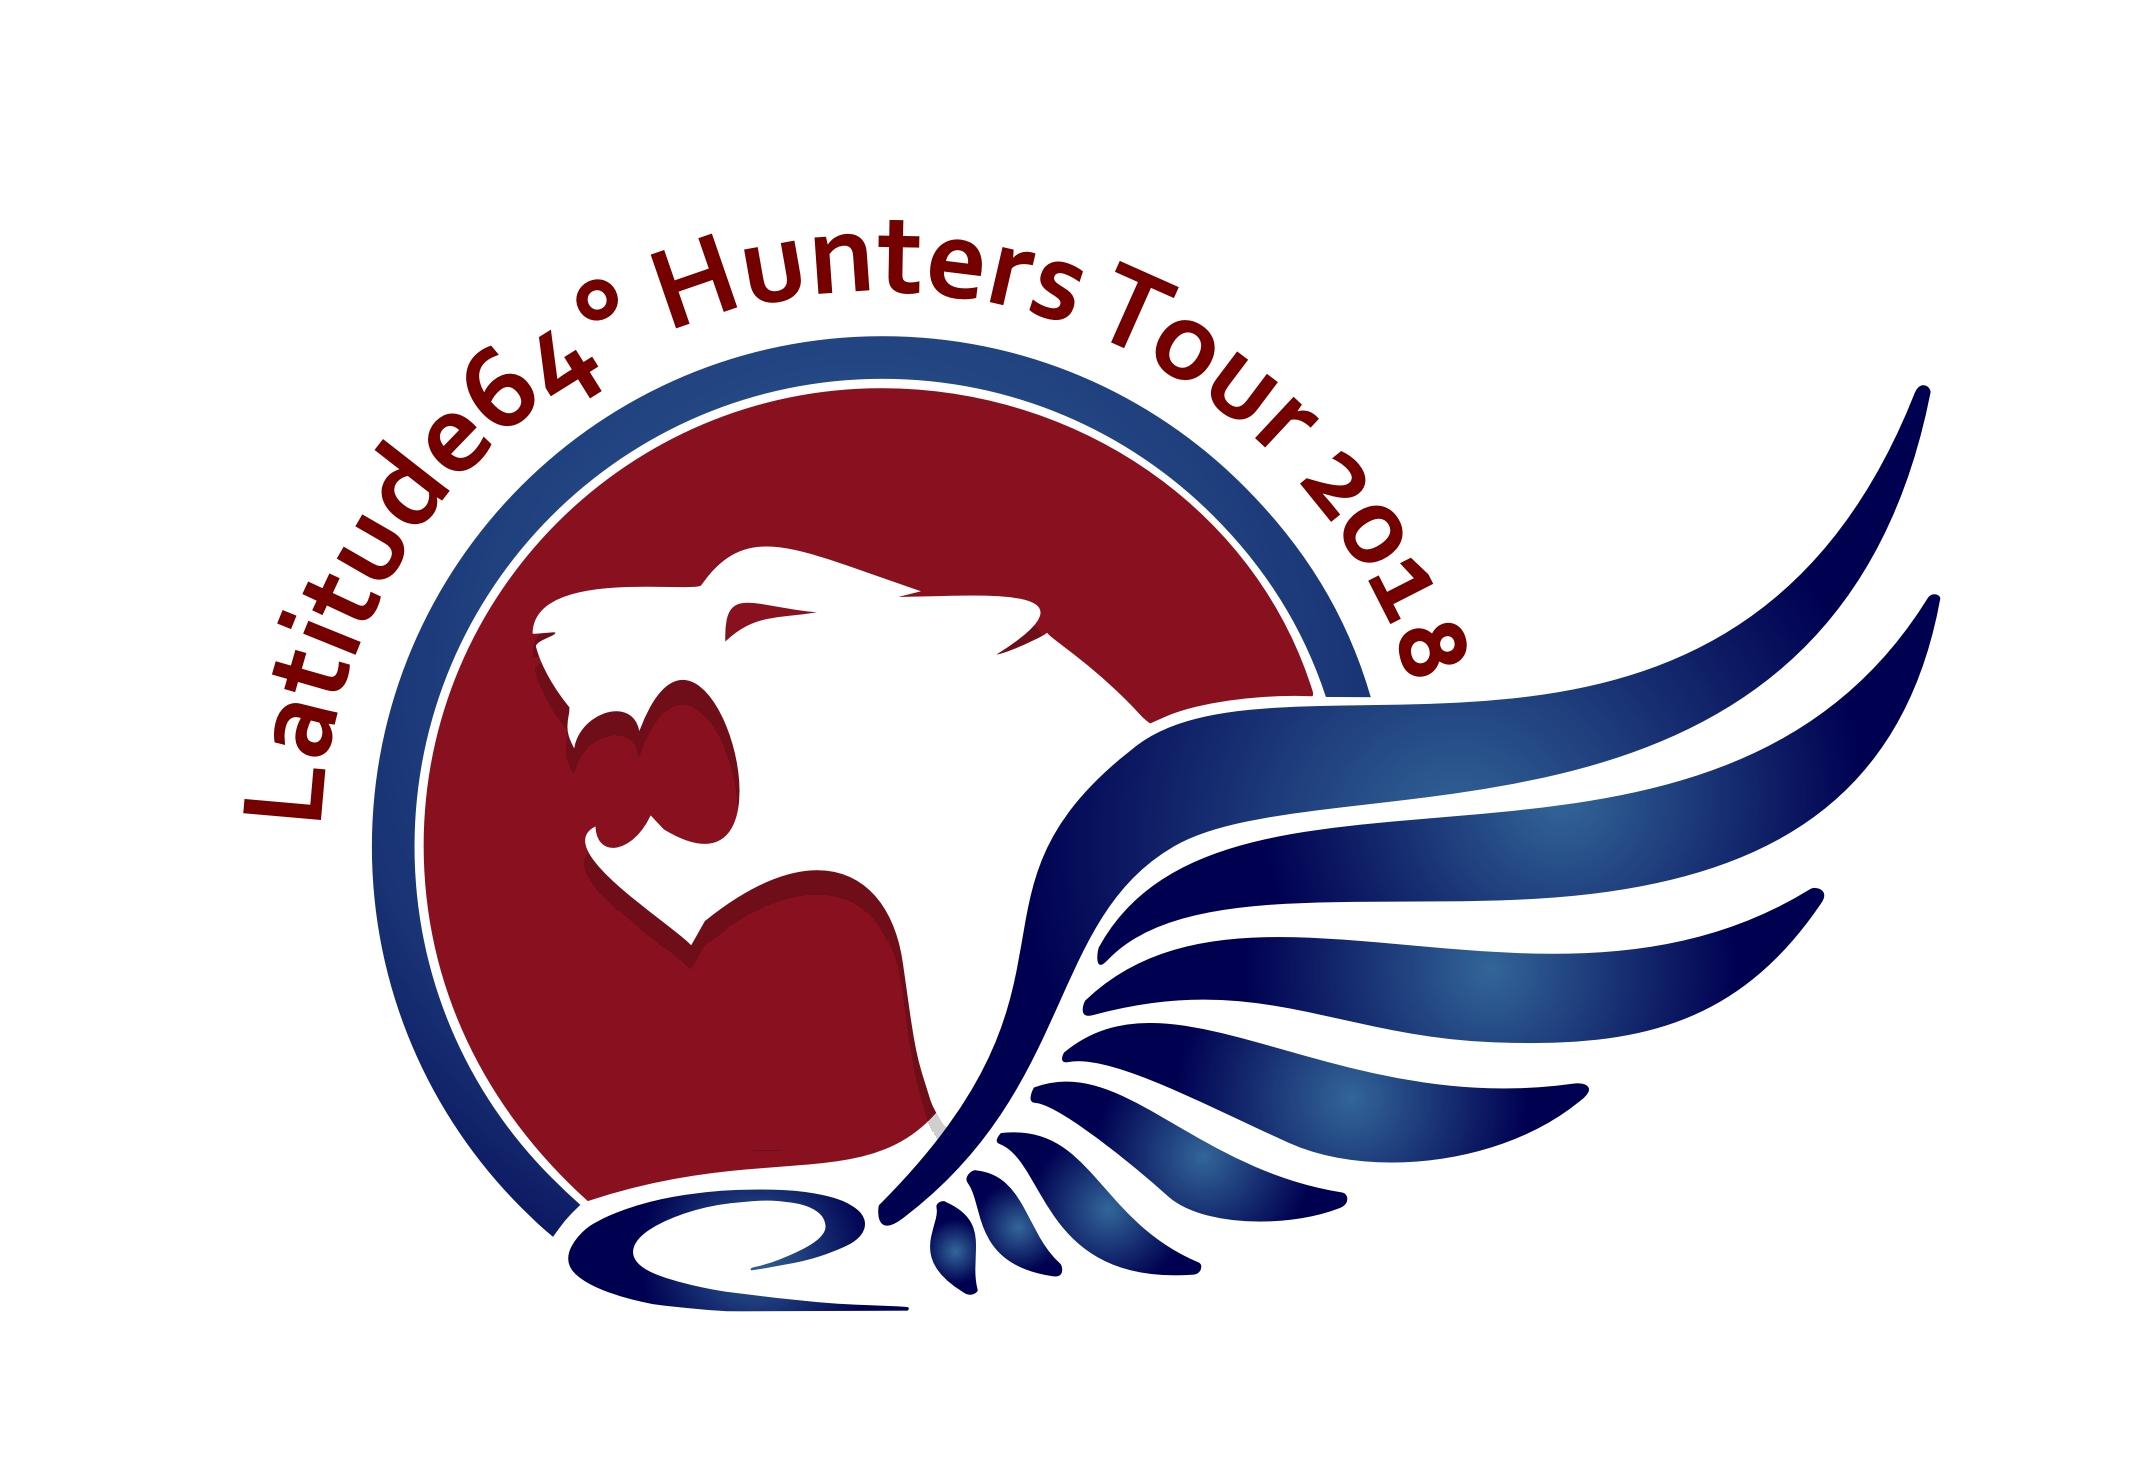 Aktualizované výsledky tour i Huntů